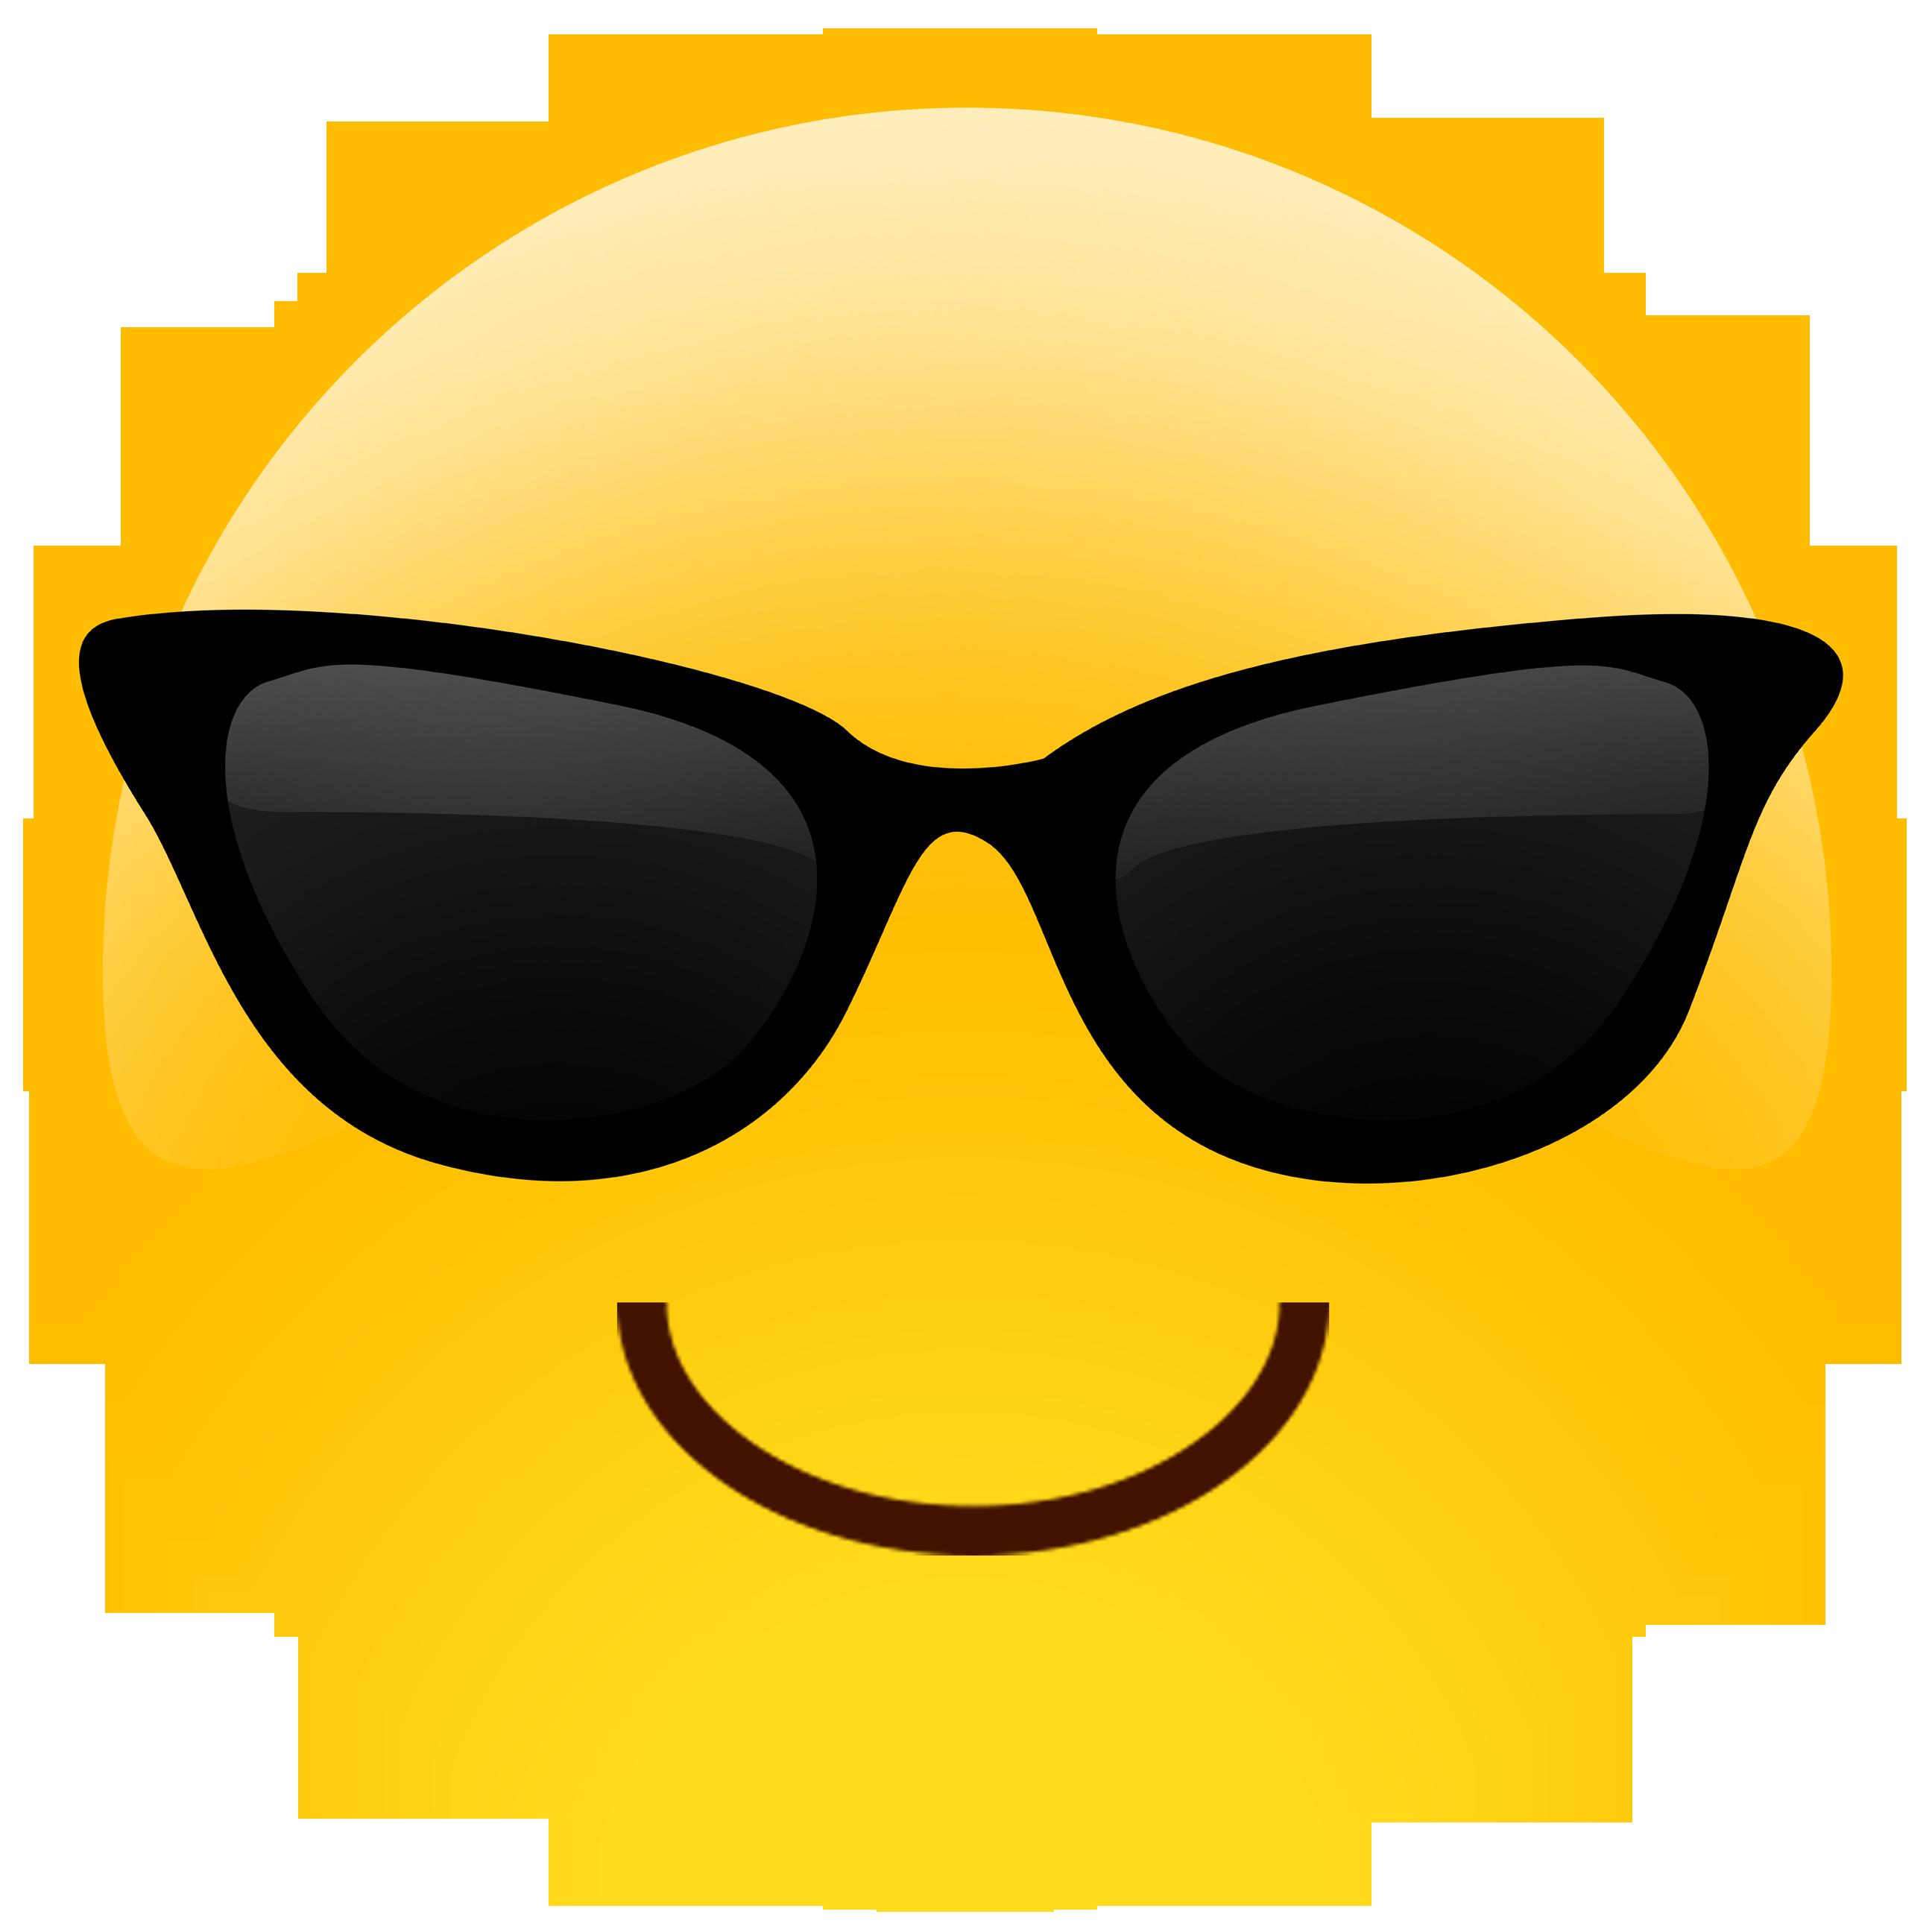 Oversized Sunglasses Cutout Emoji by Build-A-Head